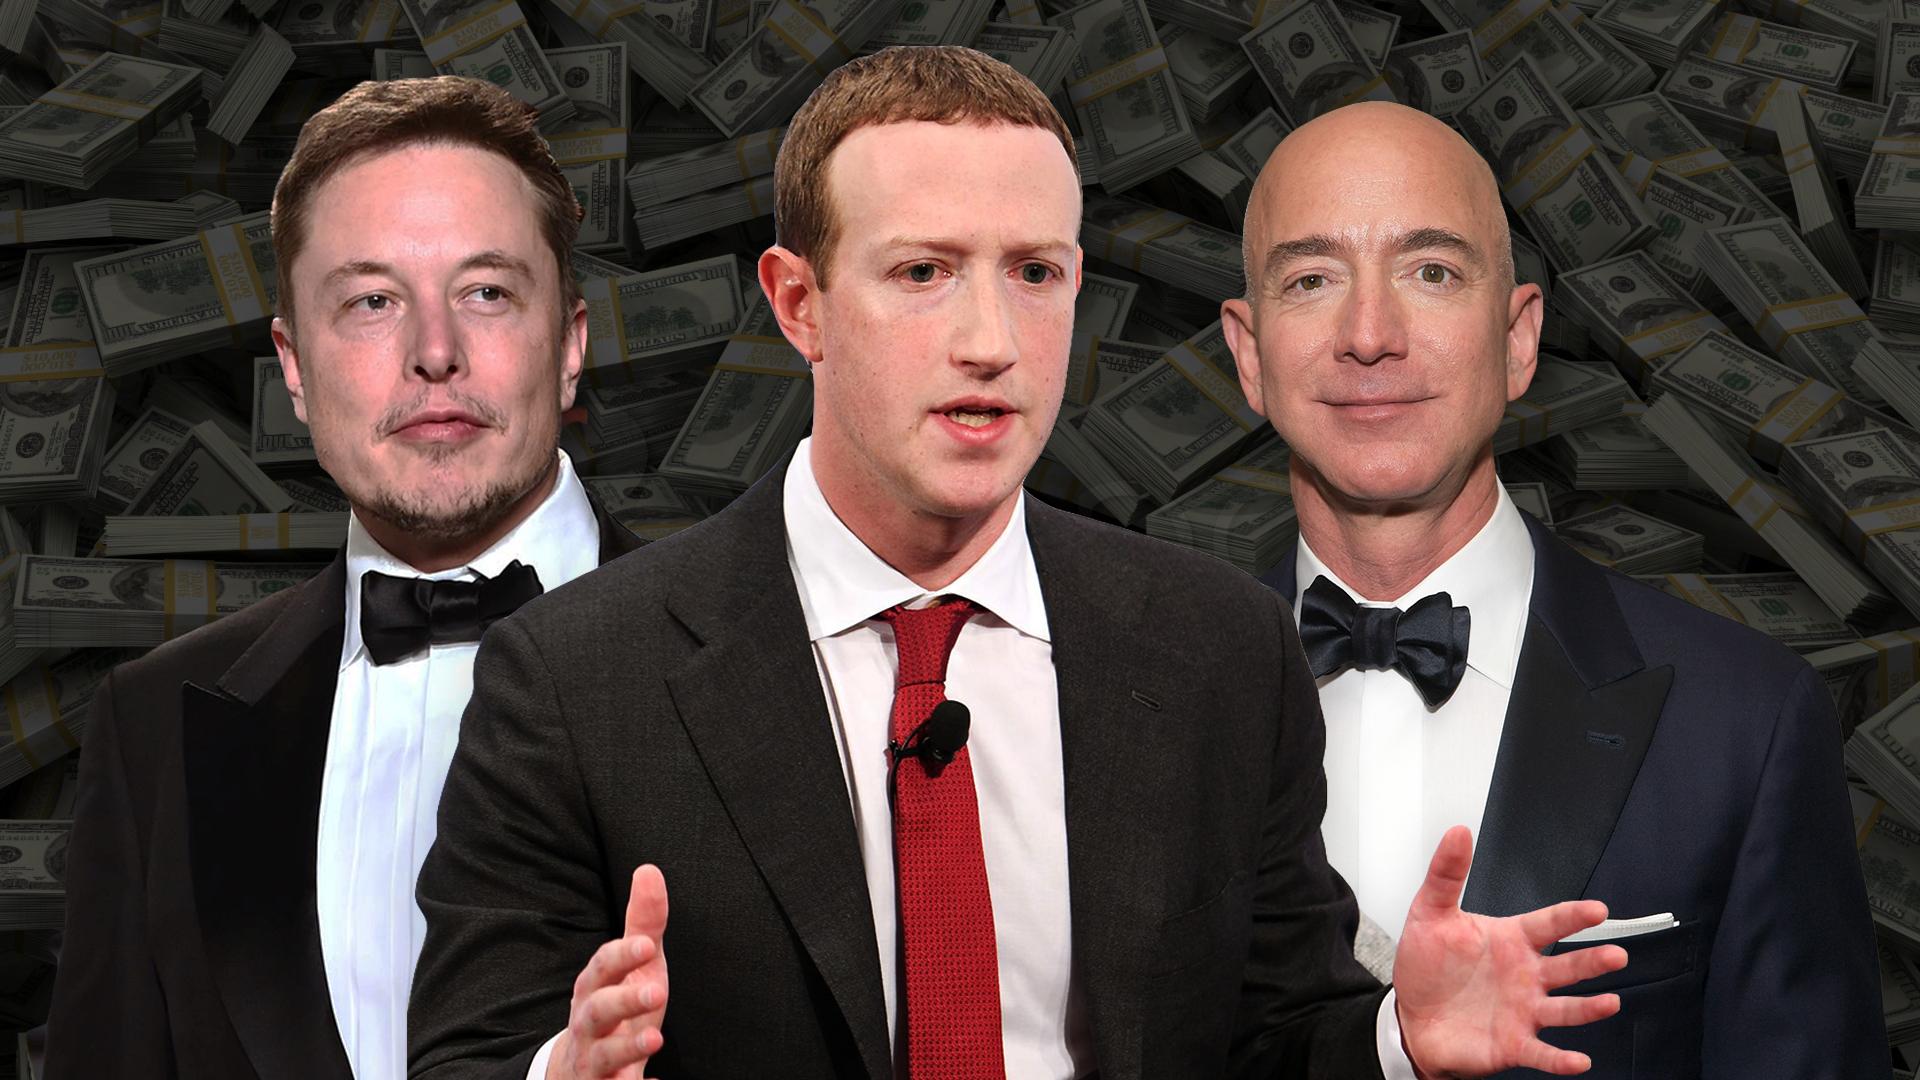 Net worth of U.S. billionaires soared by $1 trillion since pandemic began